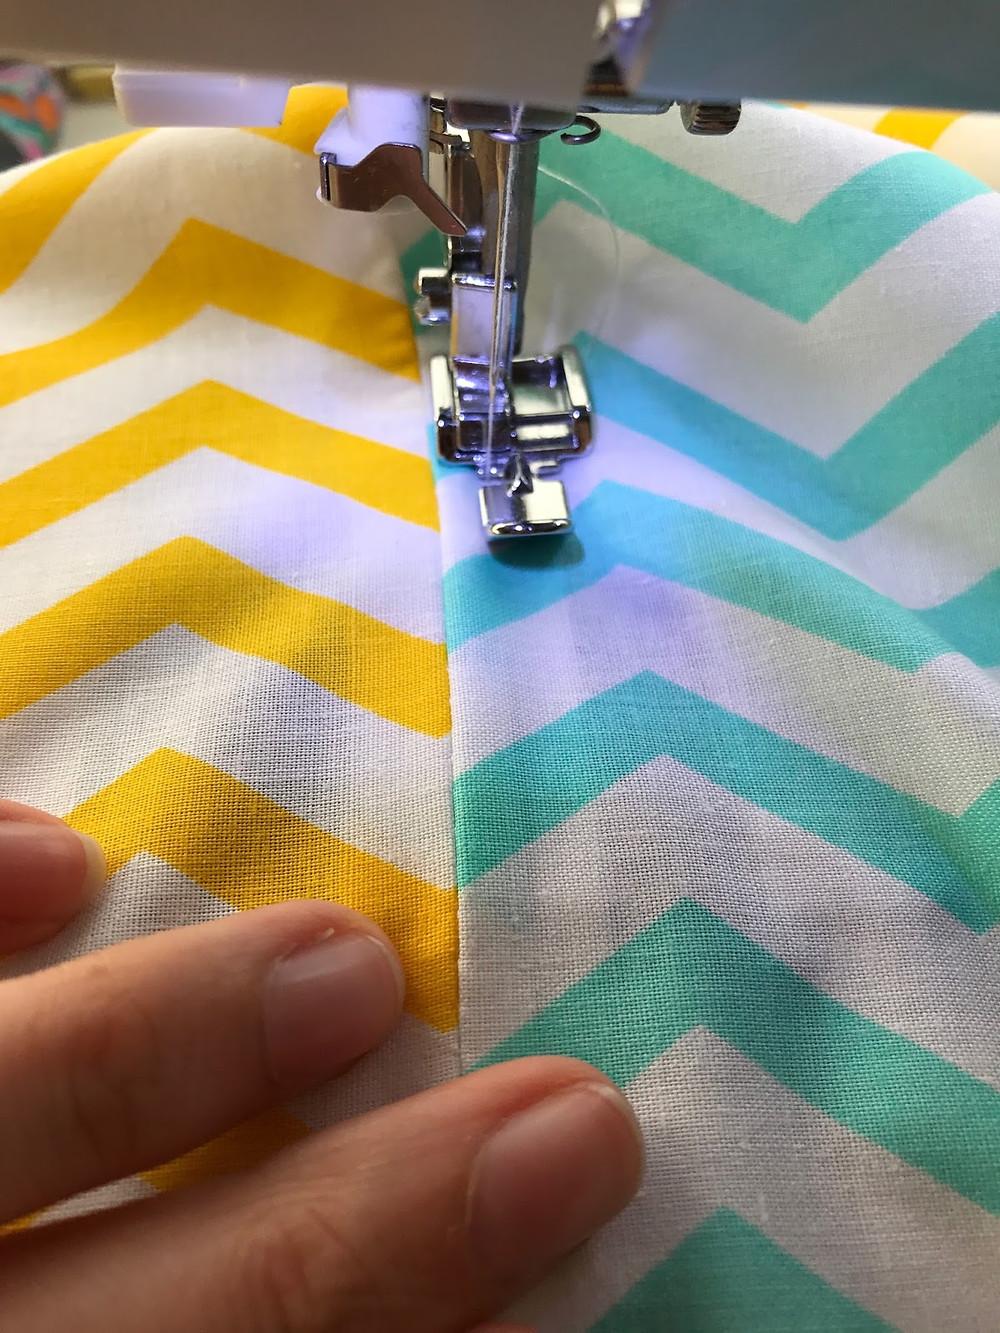 Coser o fecho na almofada do lado certo do tecido